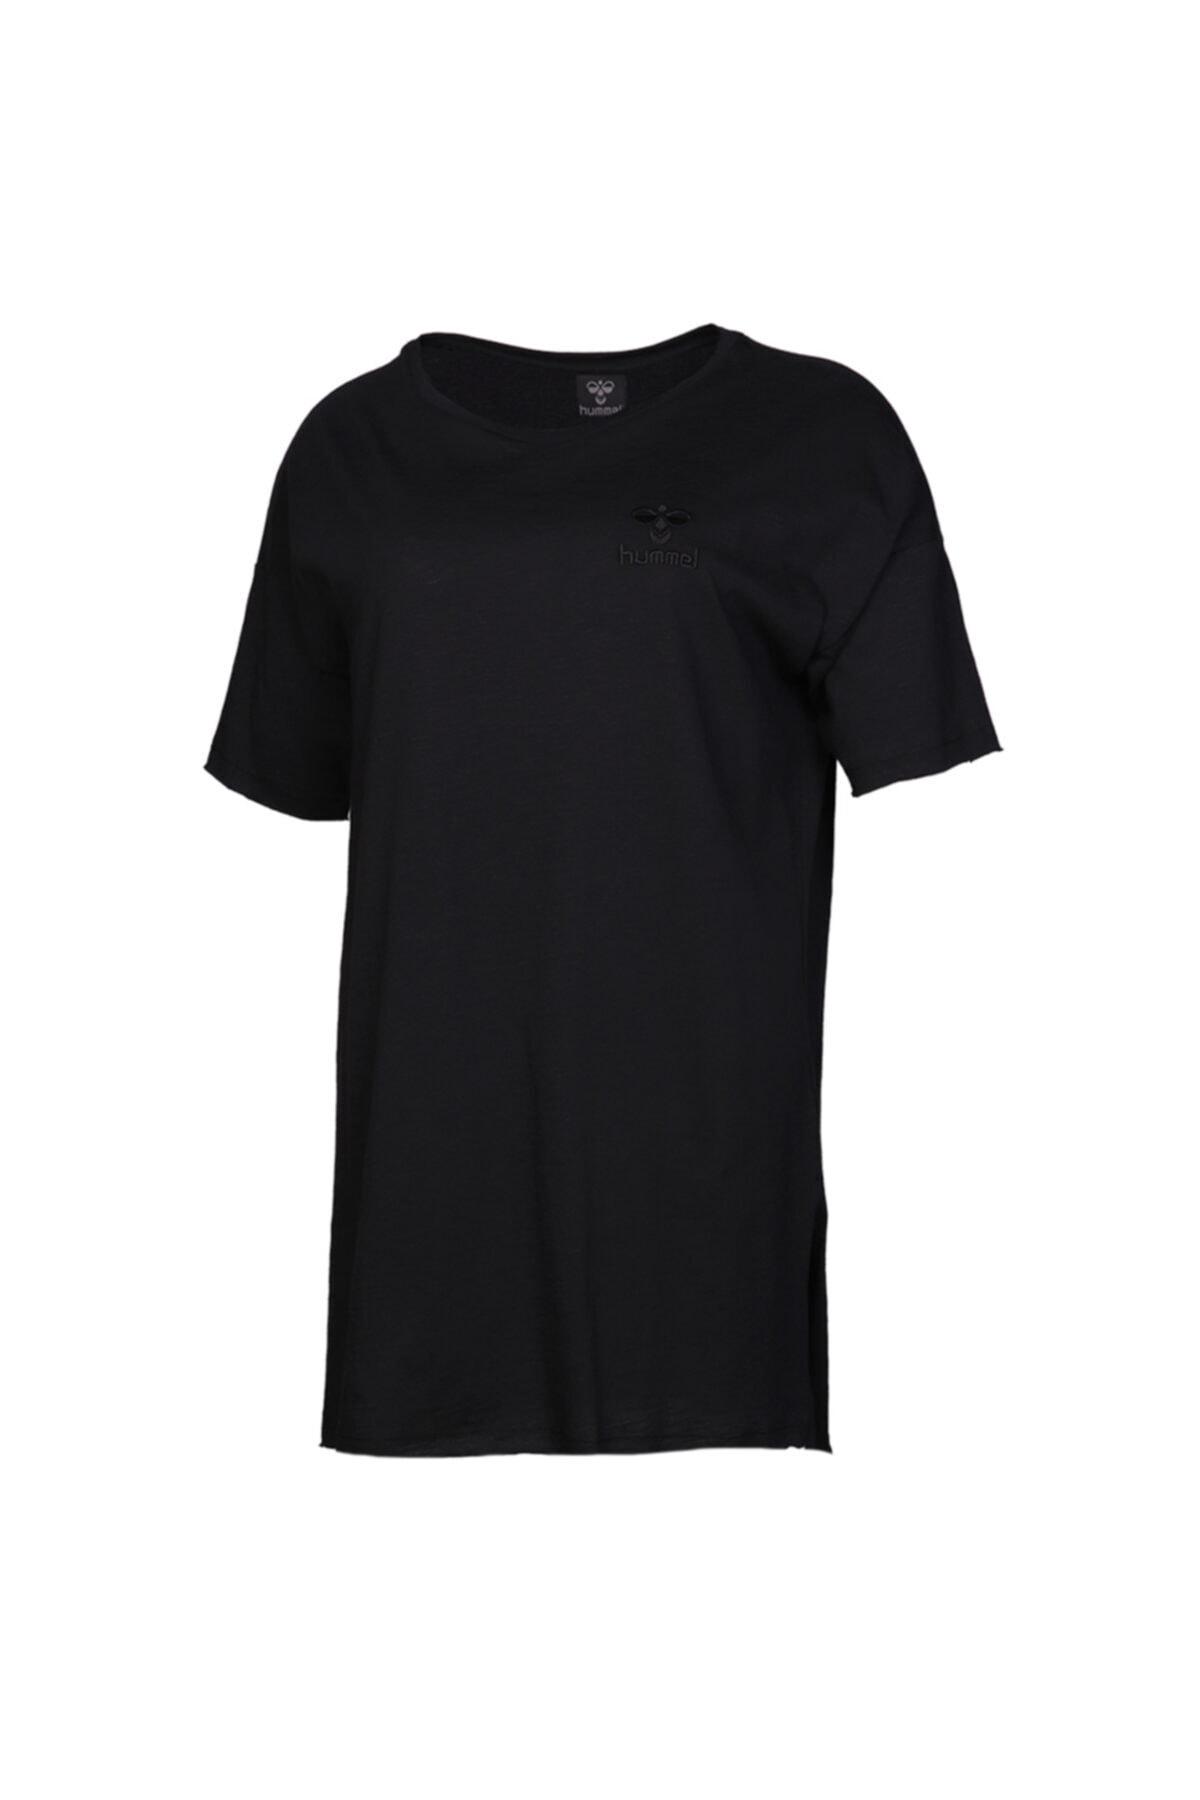 HUMMEL Alıce Kısa Kollu Tişört 1